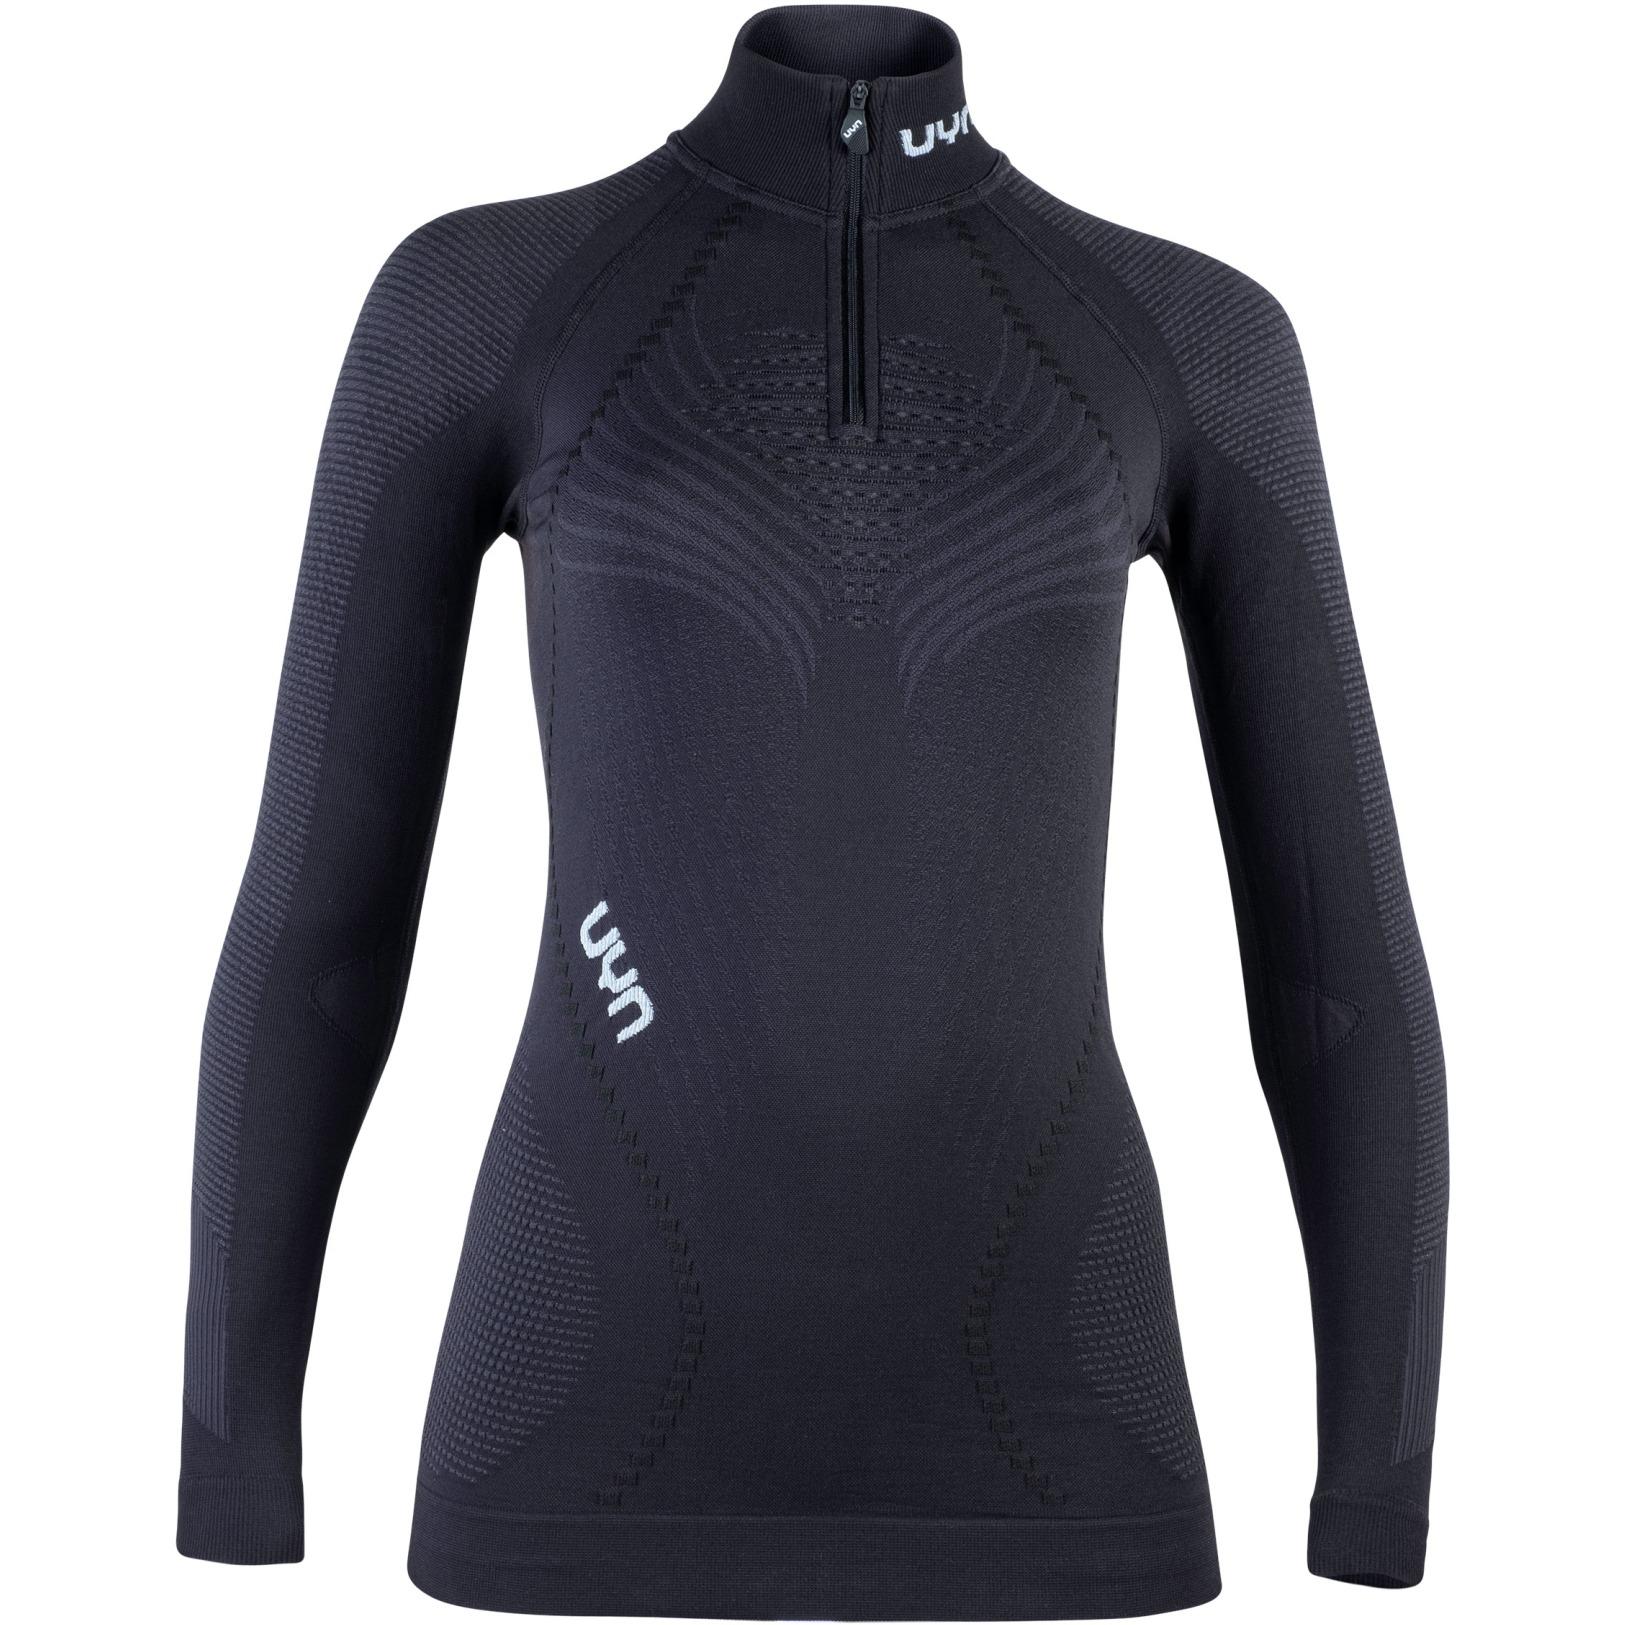 UYN Ambityon Lady Underwear Shirt Long Sleeves Zip Up Turtle Neck - Blackboard/Anthracite/White